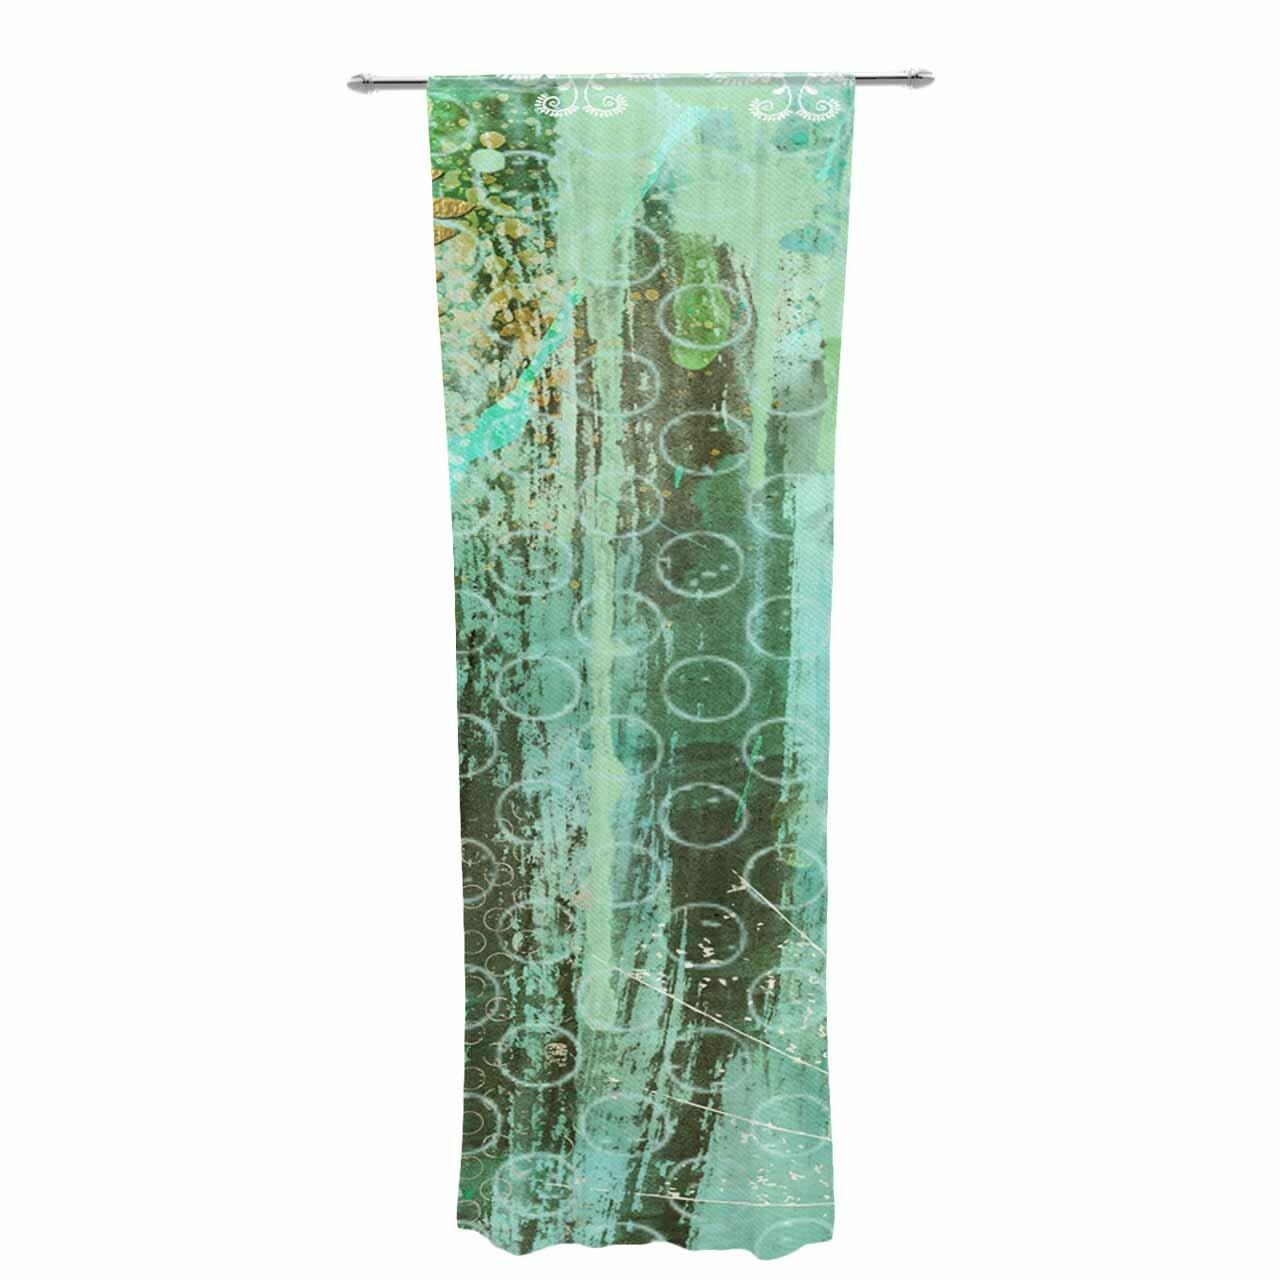 69 x 70 Shower Curtain Kess InHouse Stephanie Vaeth Under The Sea Blue Yellow Illustration